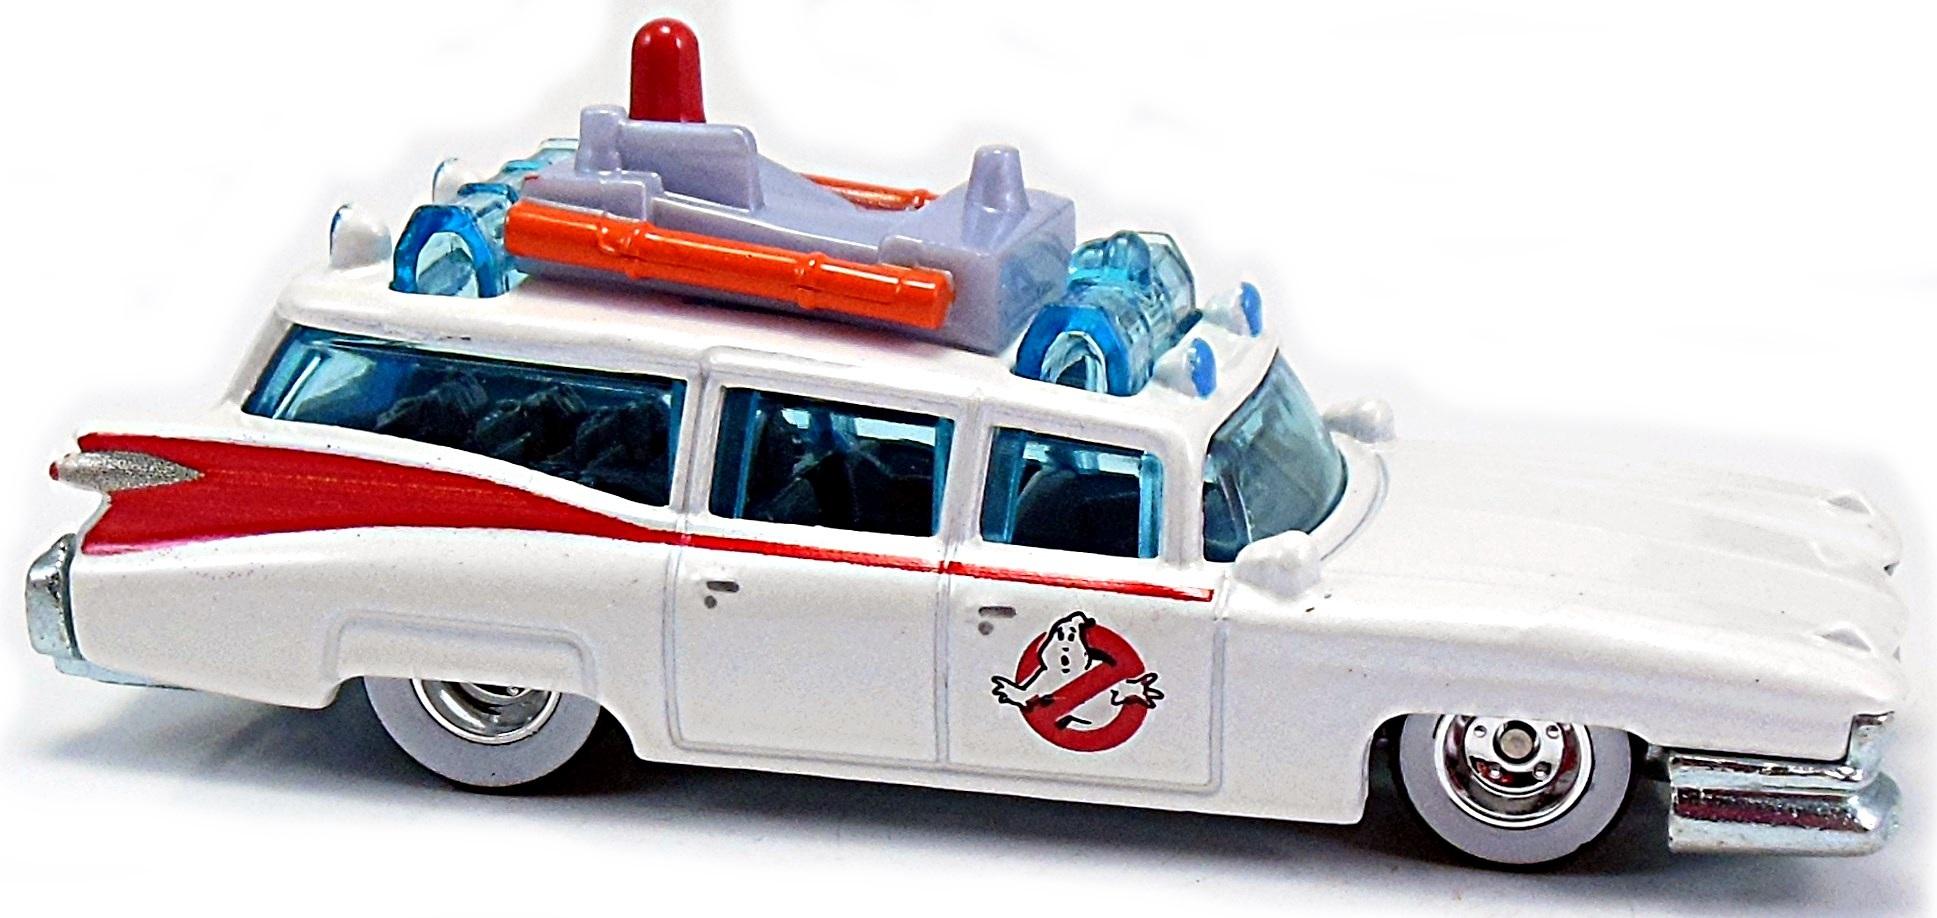 Ecto 1 Ghostbusters Cartoon Car 86mm 2015 Hot Wheels